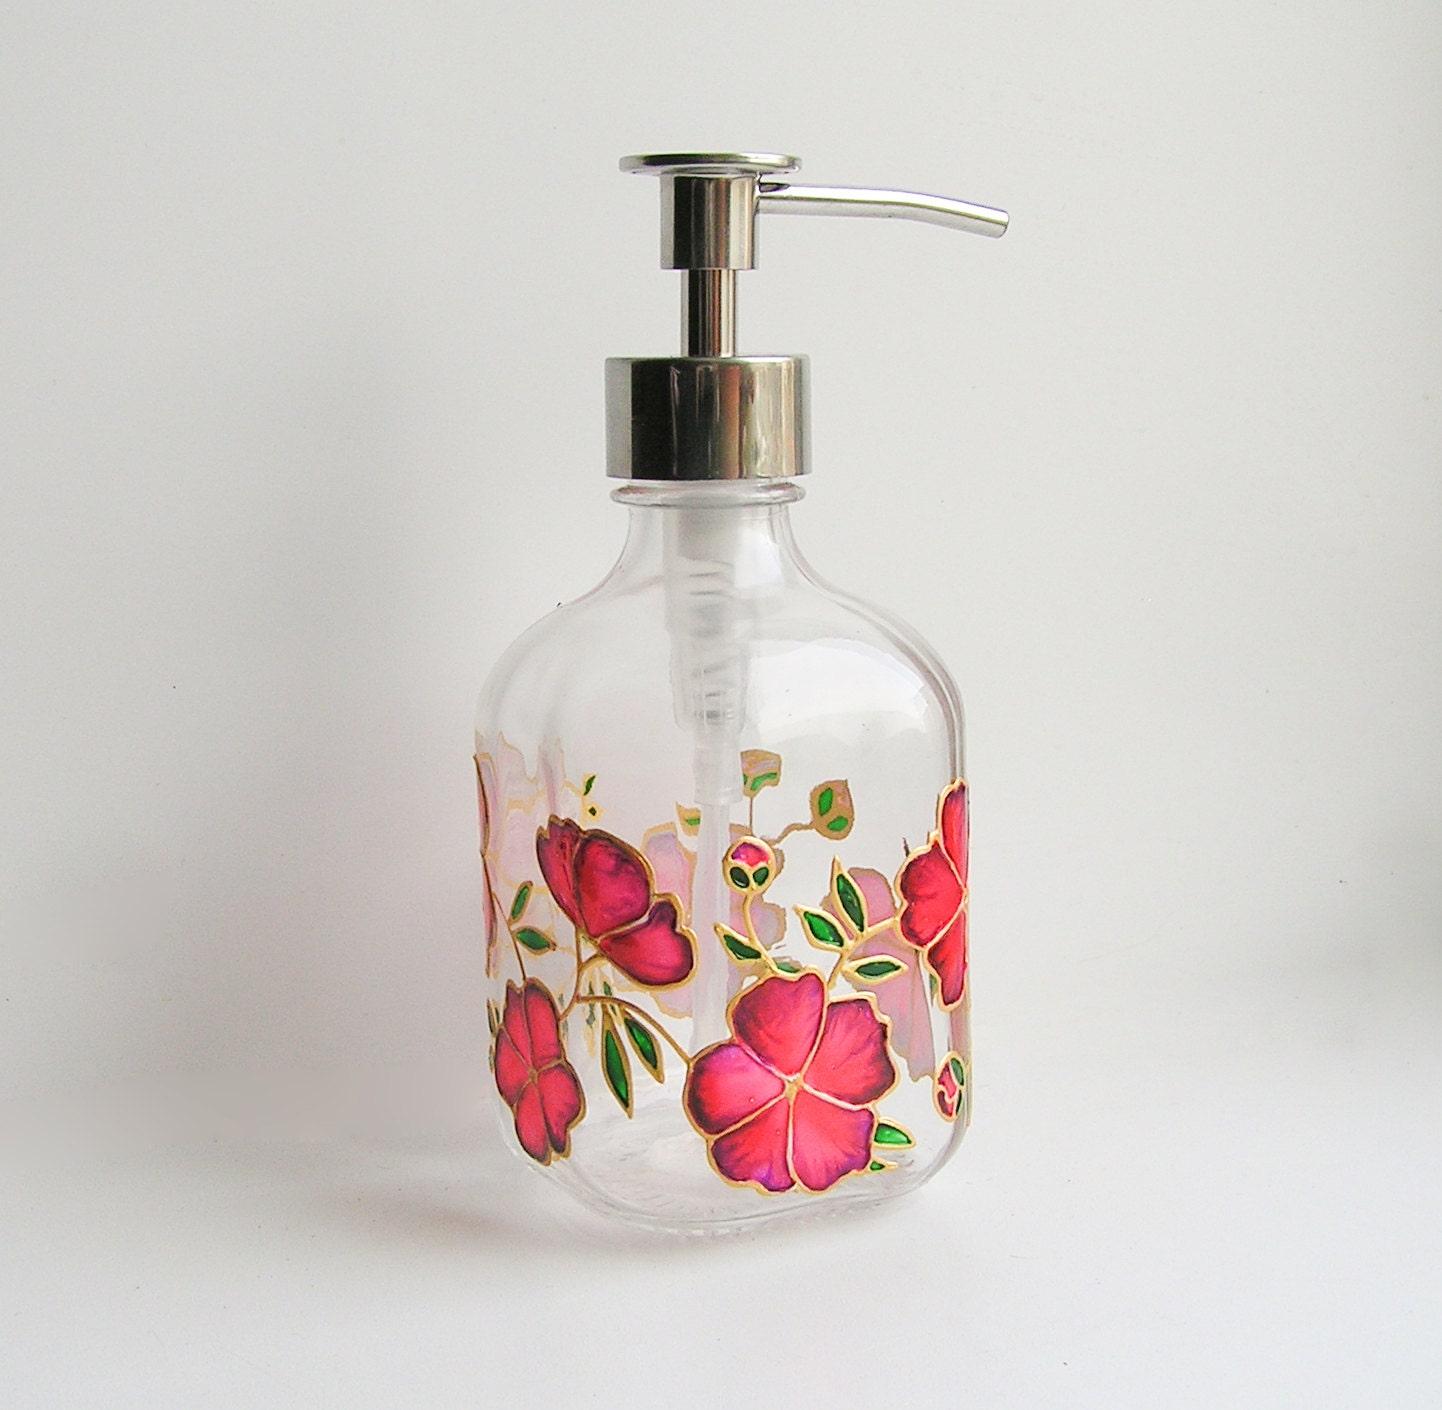 Glass Soap Dispenser Red Flowers Soap Pump Floral Design